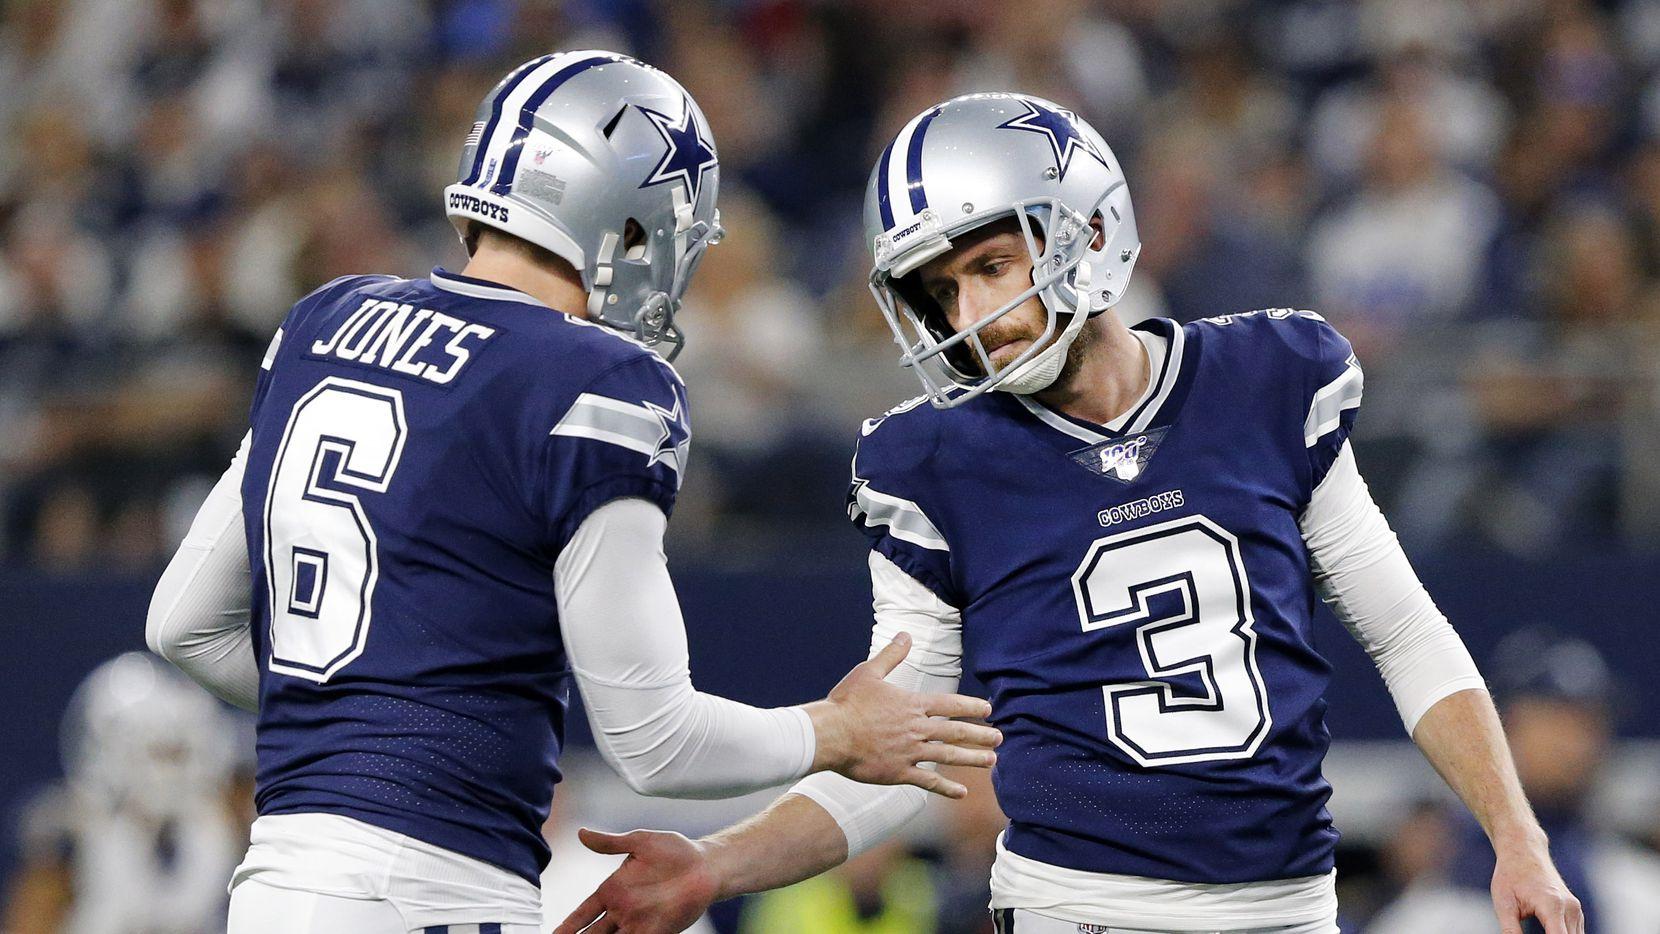 Dallas Cowboys holder Chris Jones (6) congratulates new kicker Kai Forbath (3) on his second half field goal against the Los Angeles Rams at AT&T Stadium in Arlington, Texas, Sunday, December 15, 2019. The Cowboys defeated the Rams, 44-21.